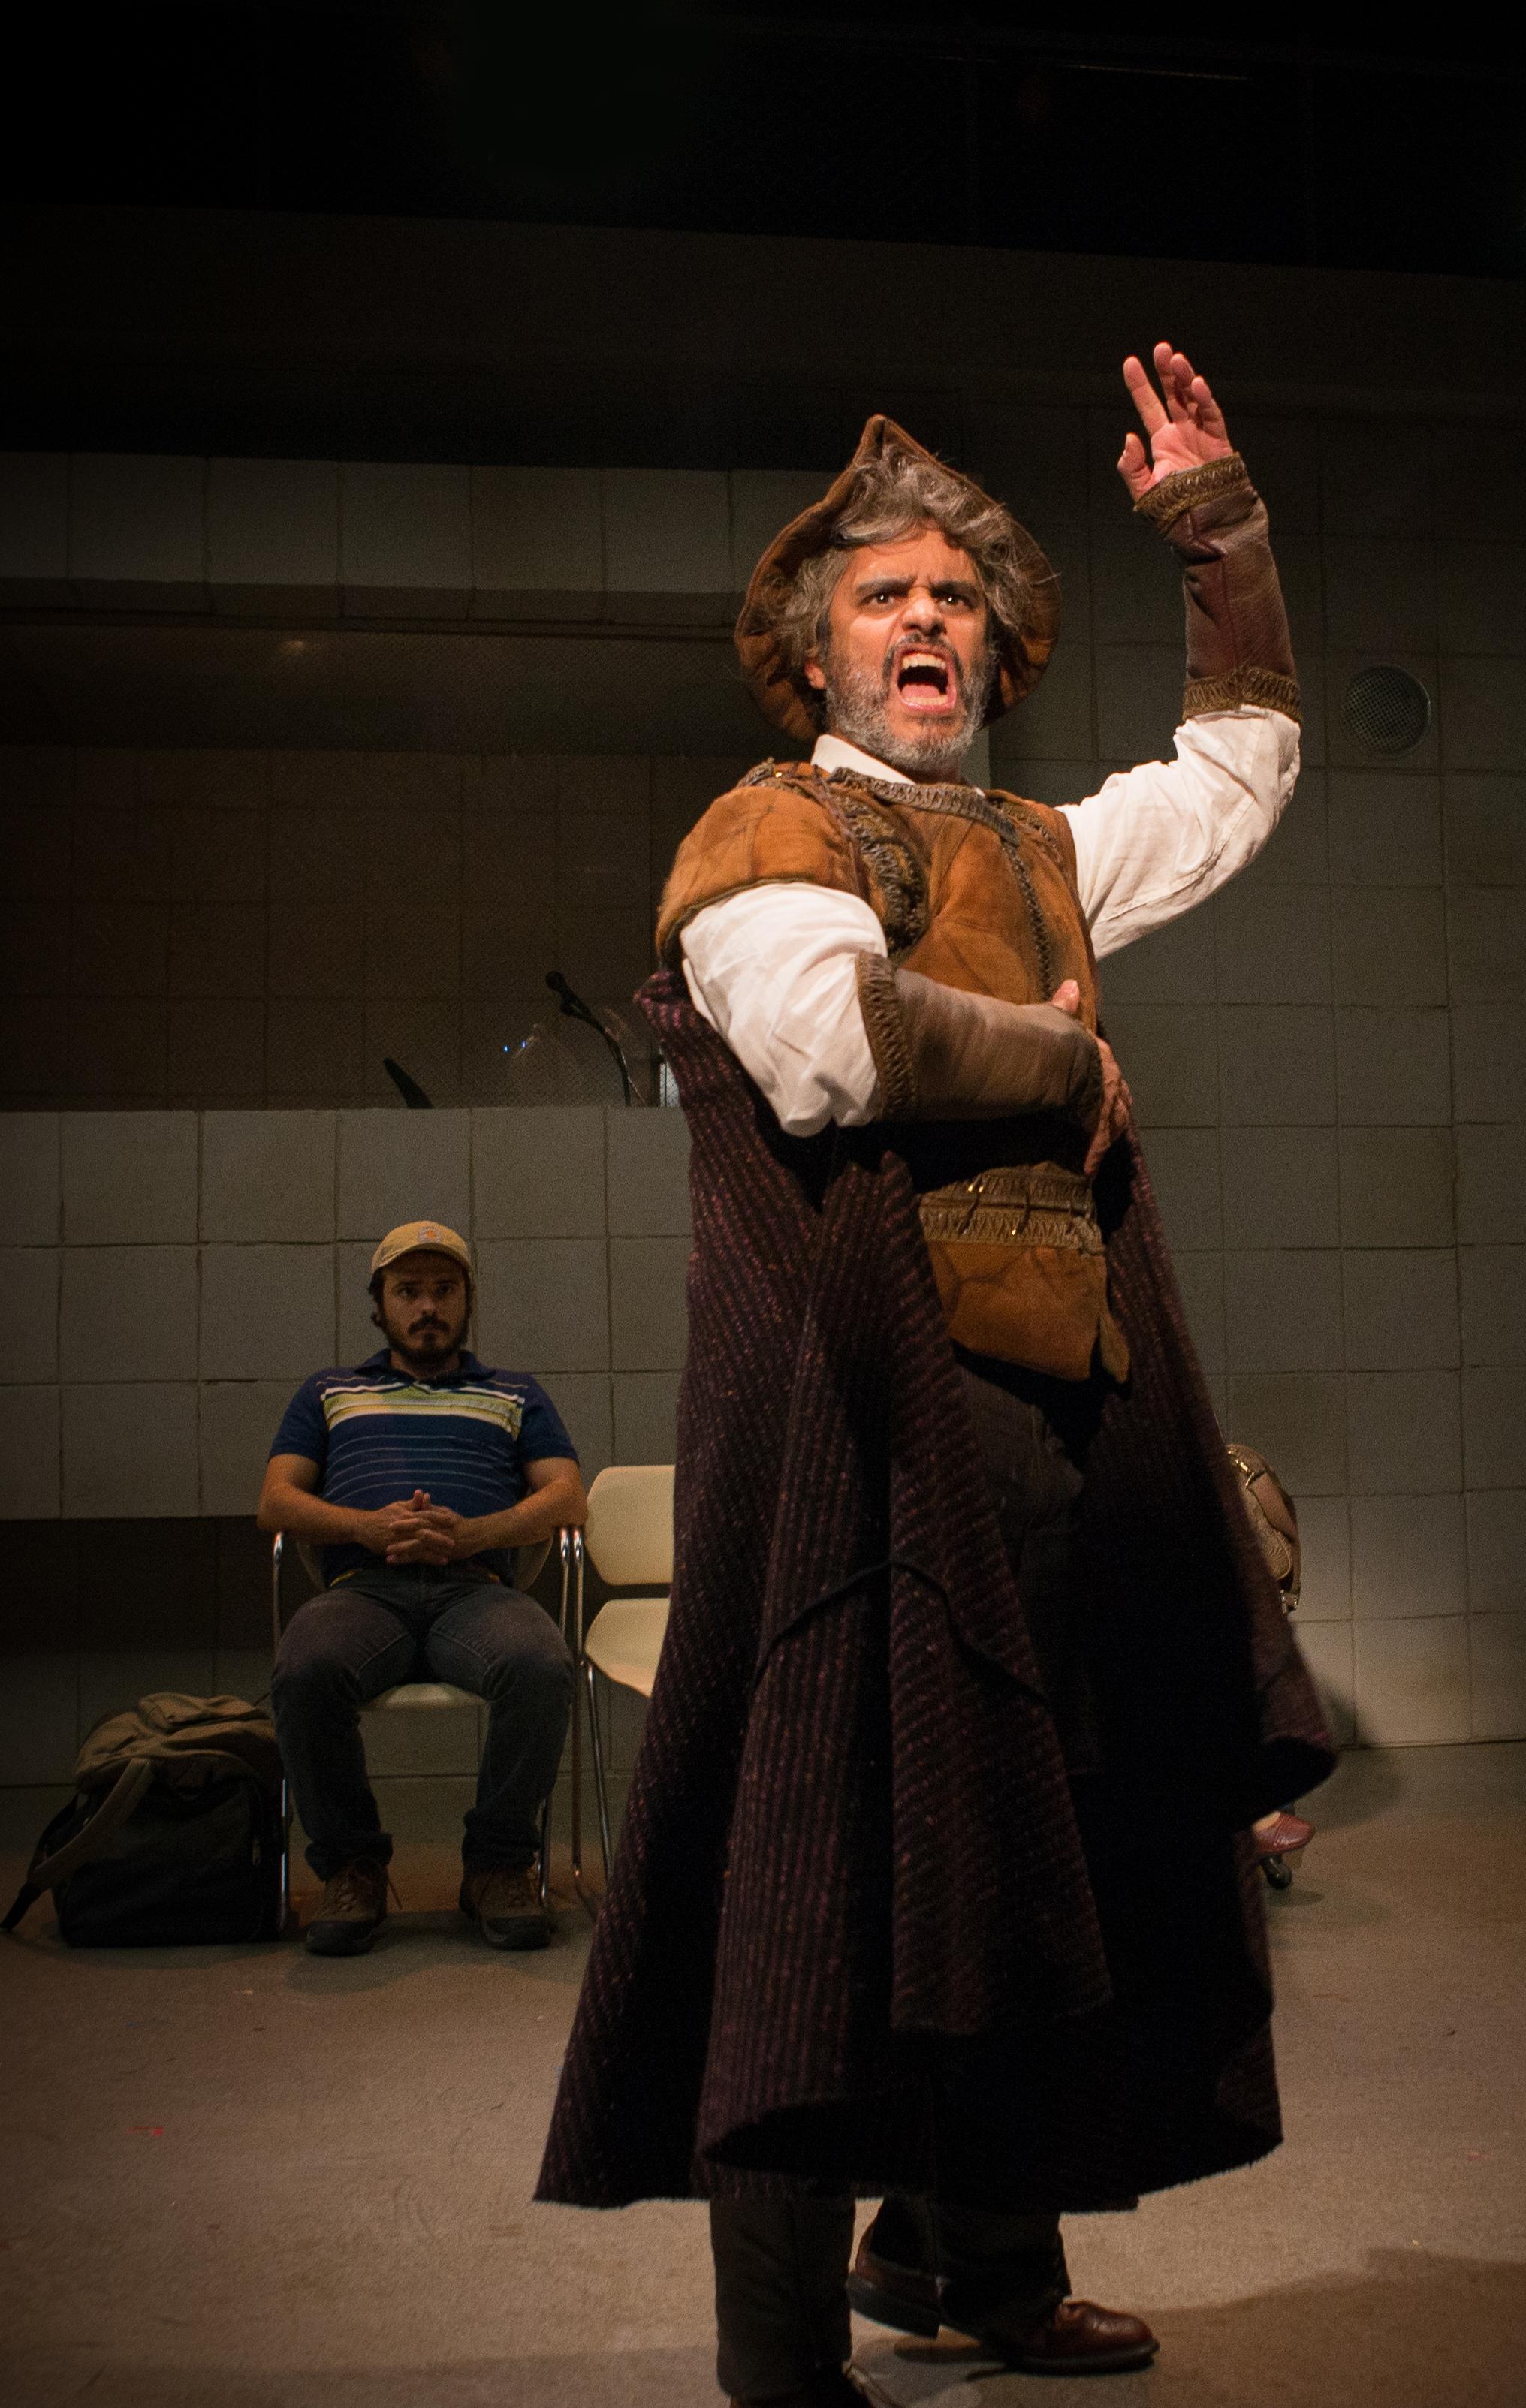 Martín Solá as Don Quixote, Photo by Allen Weeks